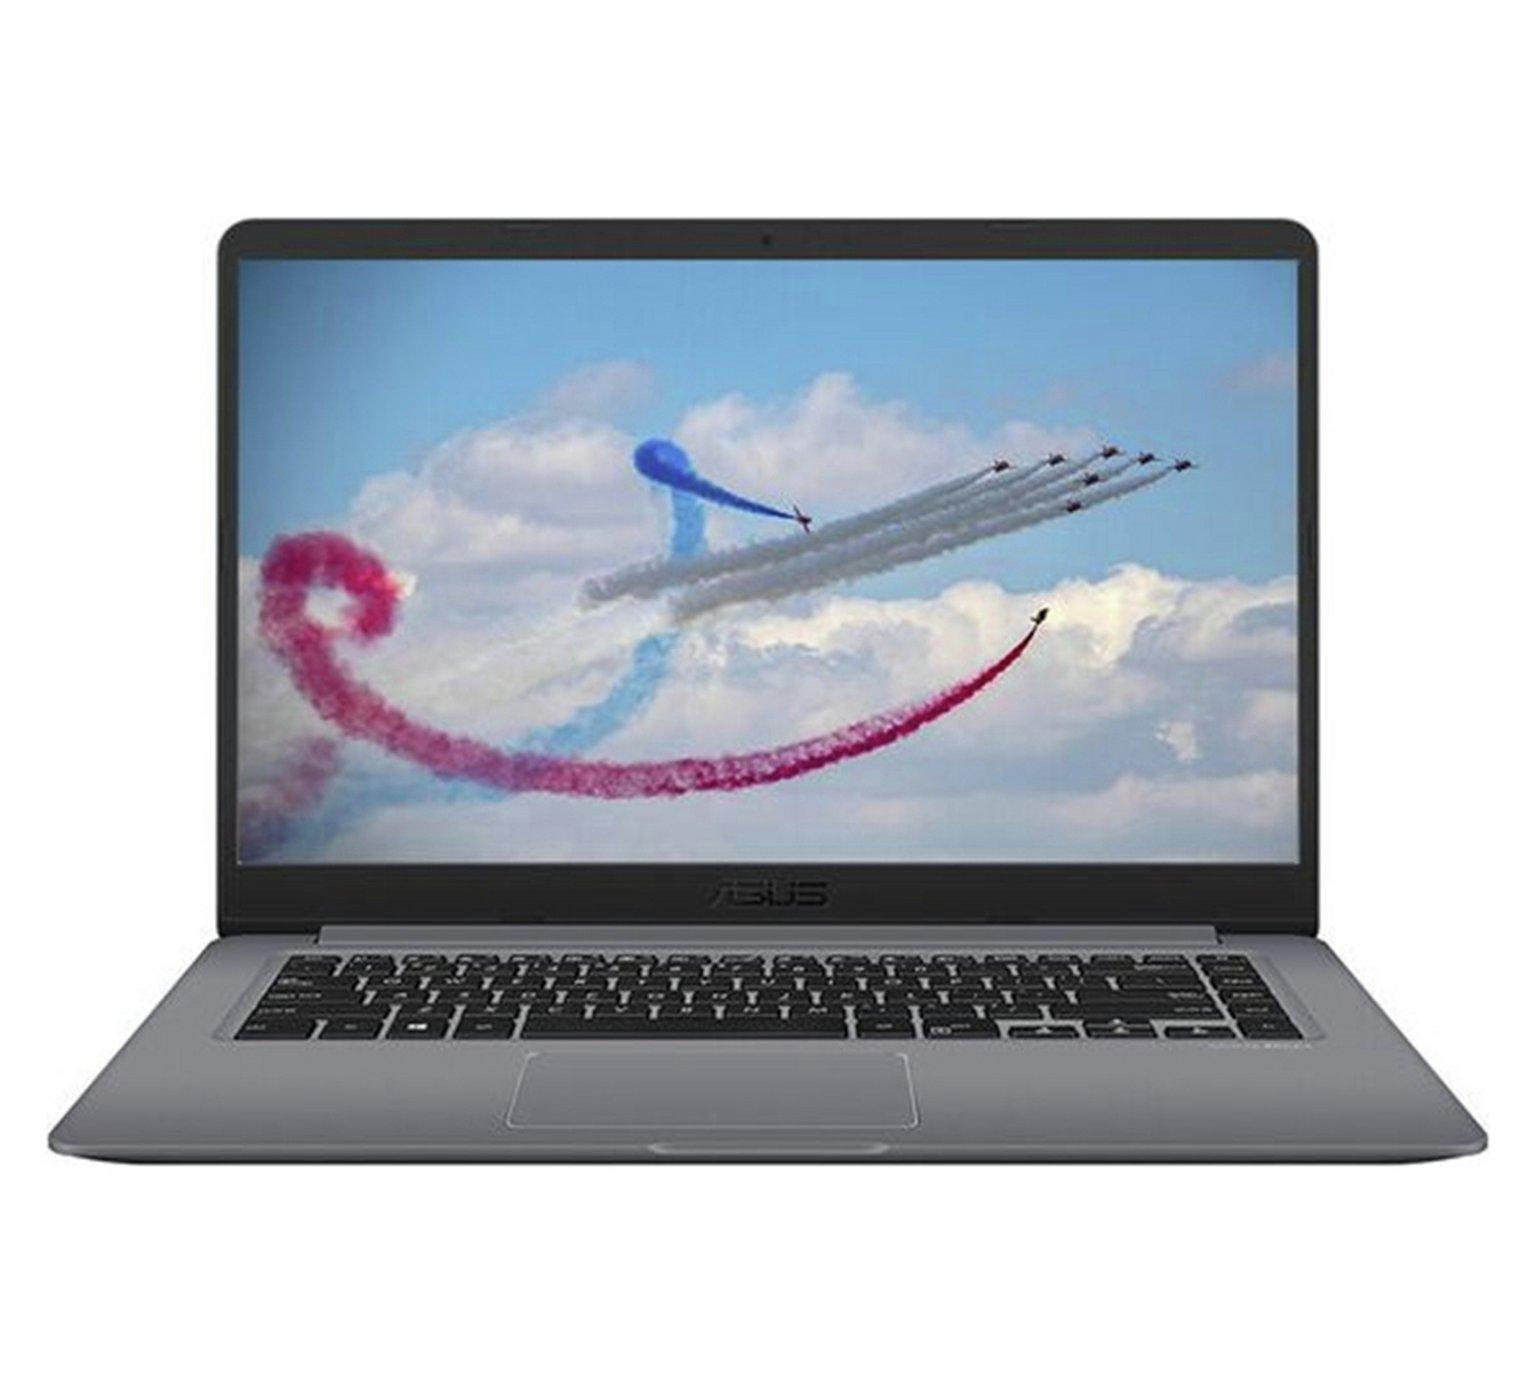 Asus VivoBook 15 15.6 Inch i5 4GB/16GB Optane 1TB Laptop